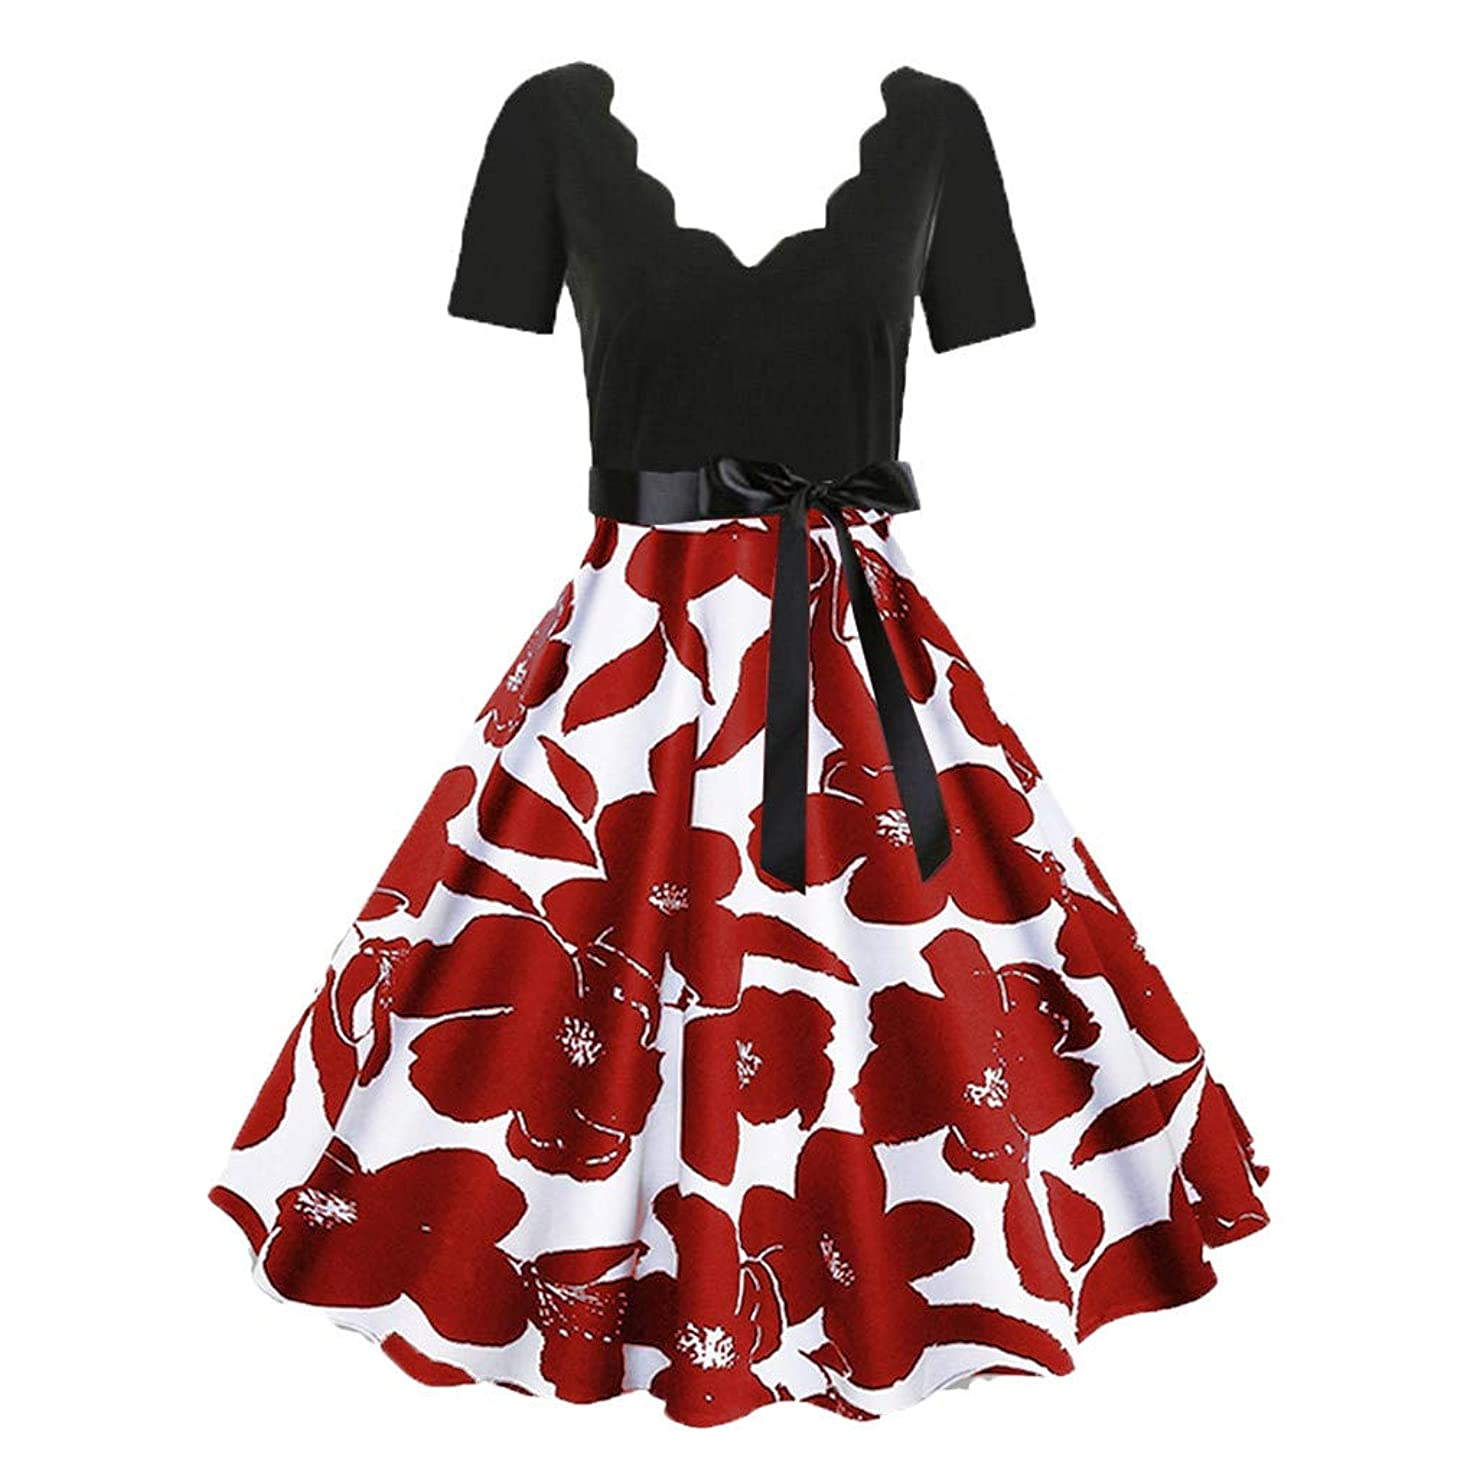 KASAAS Floral Print Vintage Dress for Women Short Sleeve V-Neck Tie-Bow Retro Flare A-Line Dresses